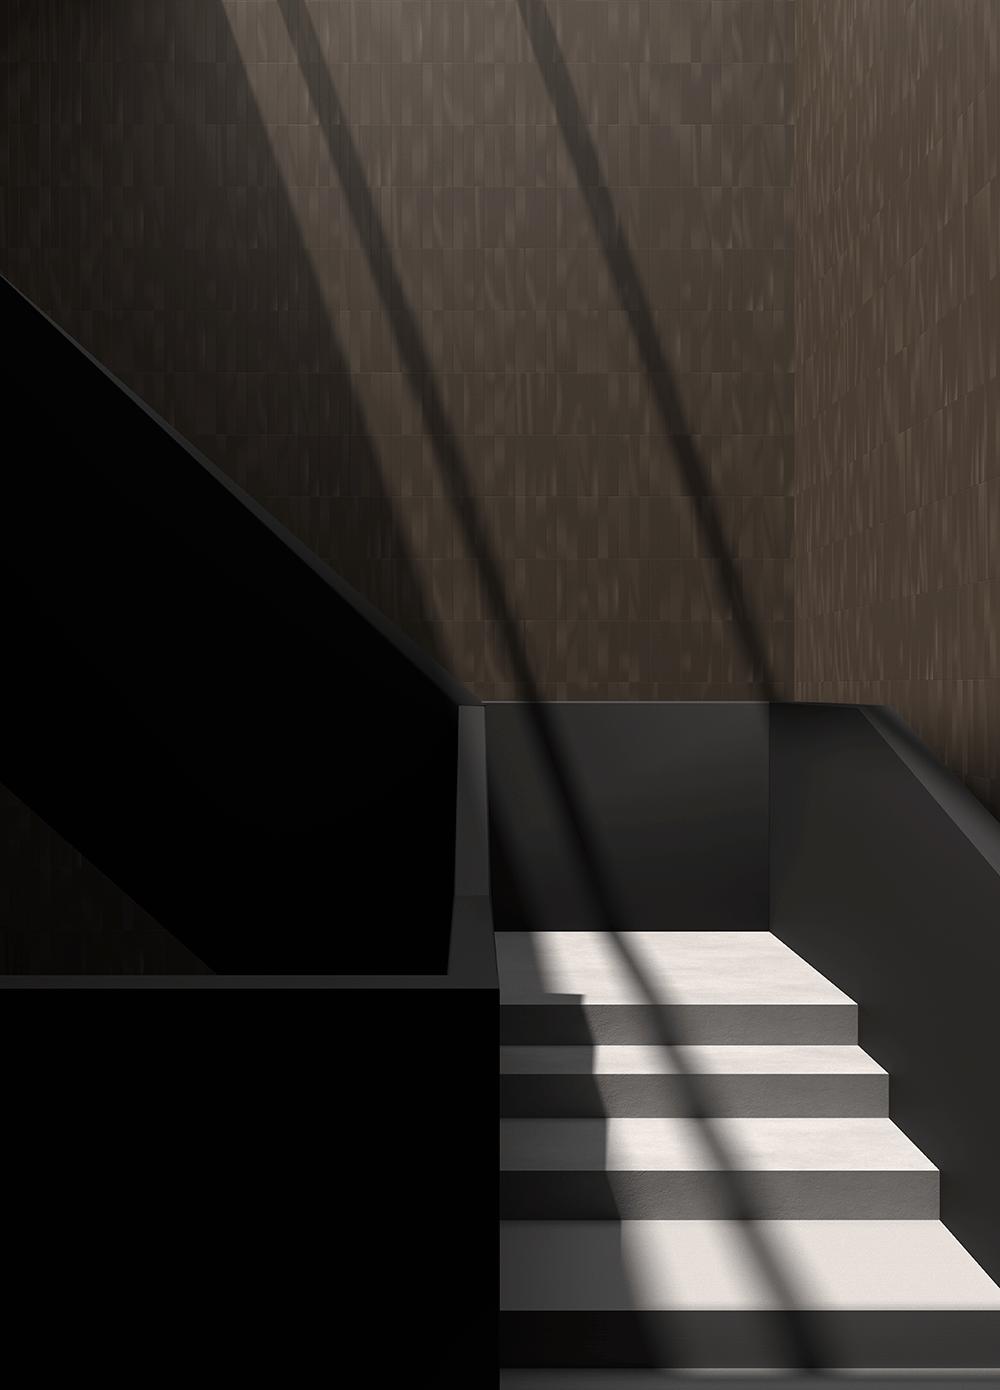 balance-silt-5x30